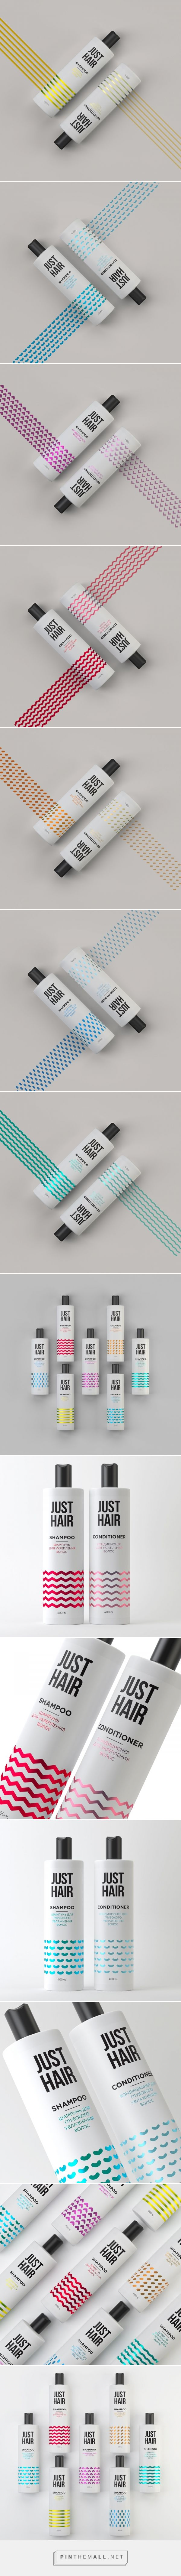 Just Hair packaging design by Pavel Kulinsky - https://www.packagingoftheworld.com/2018/04/just-hair.html